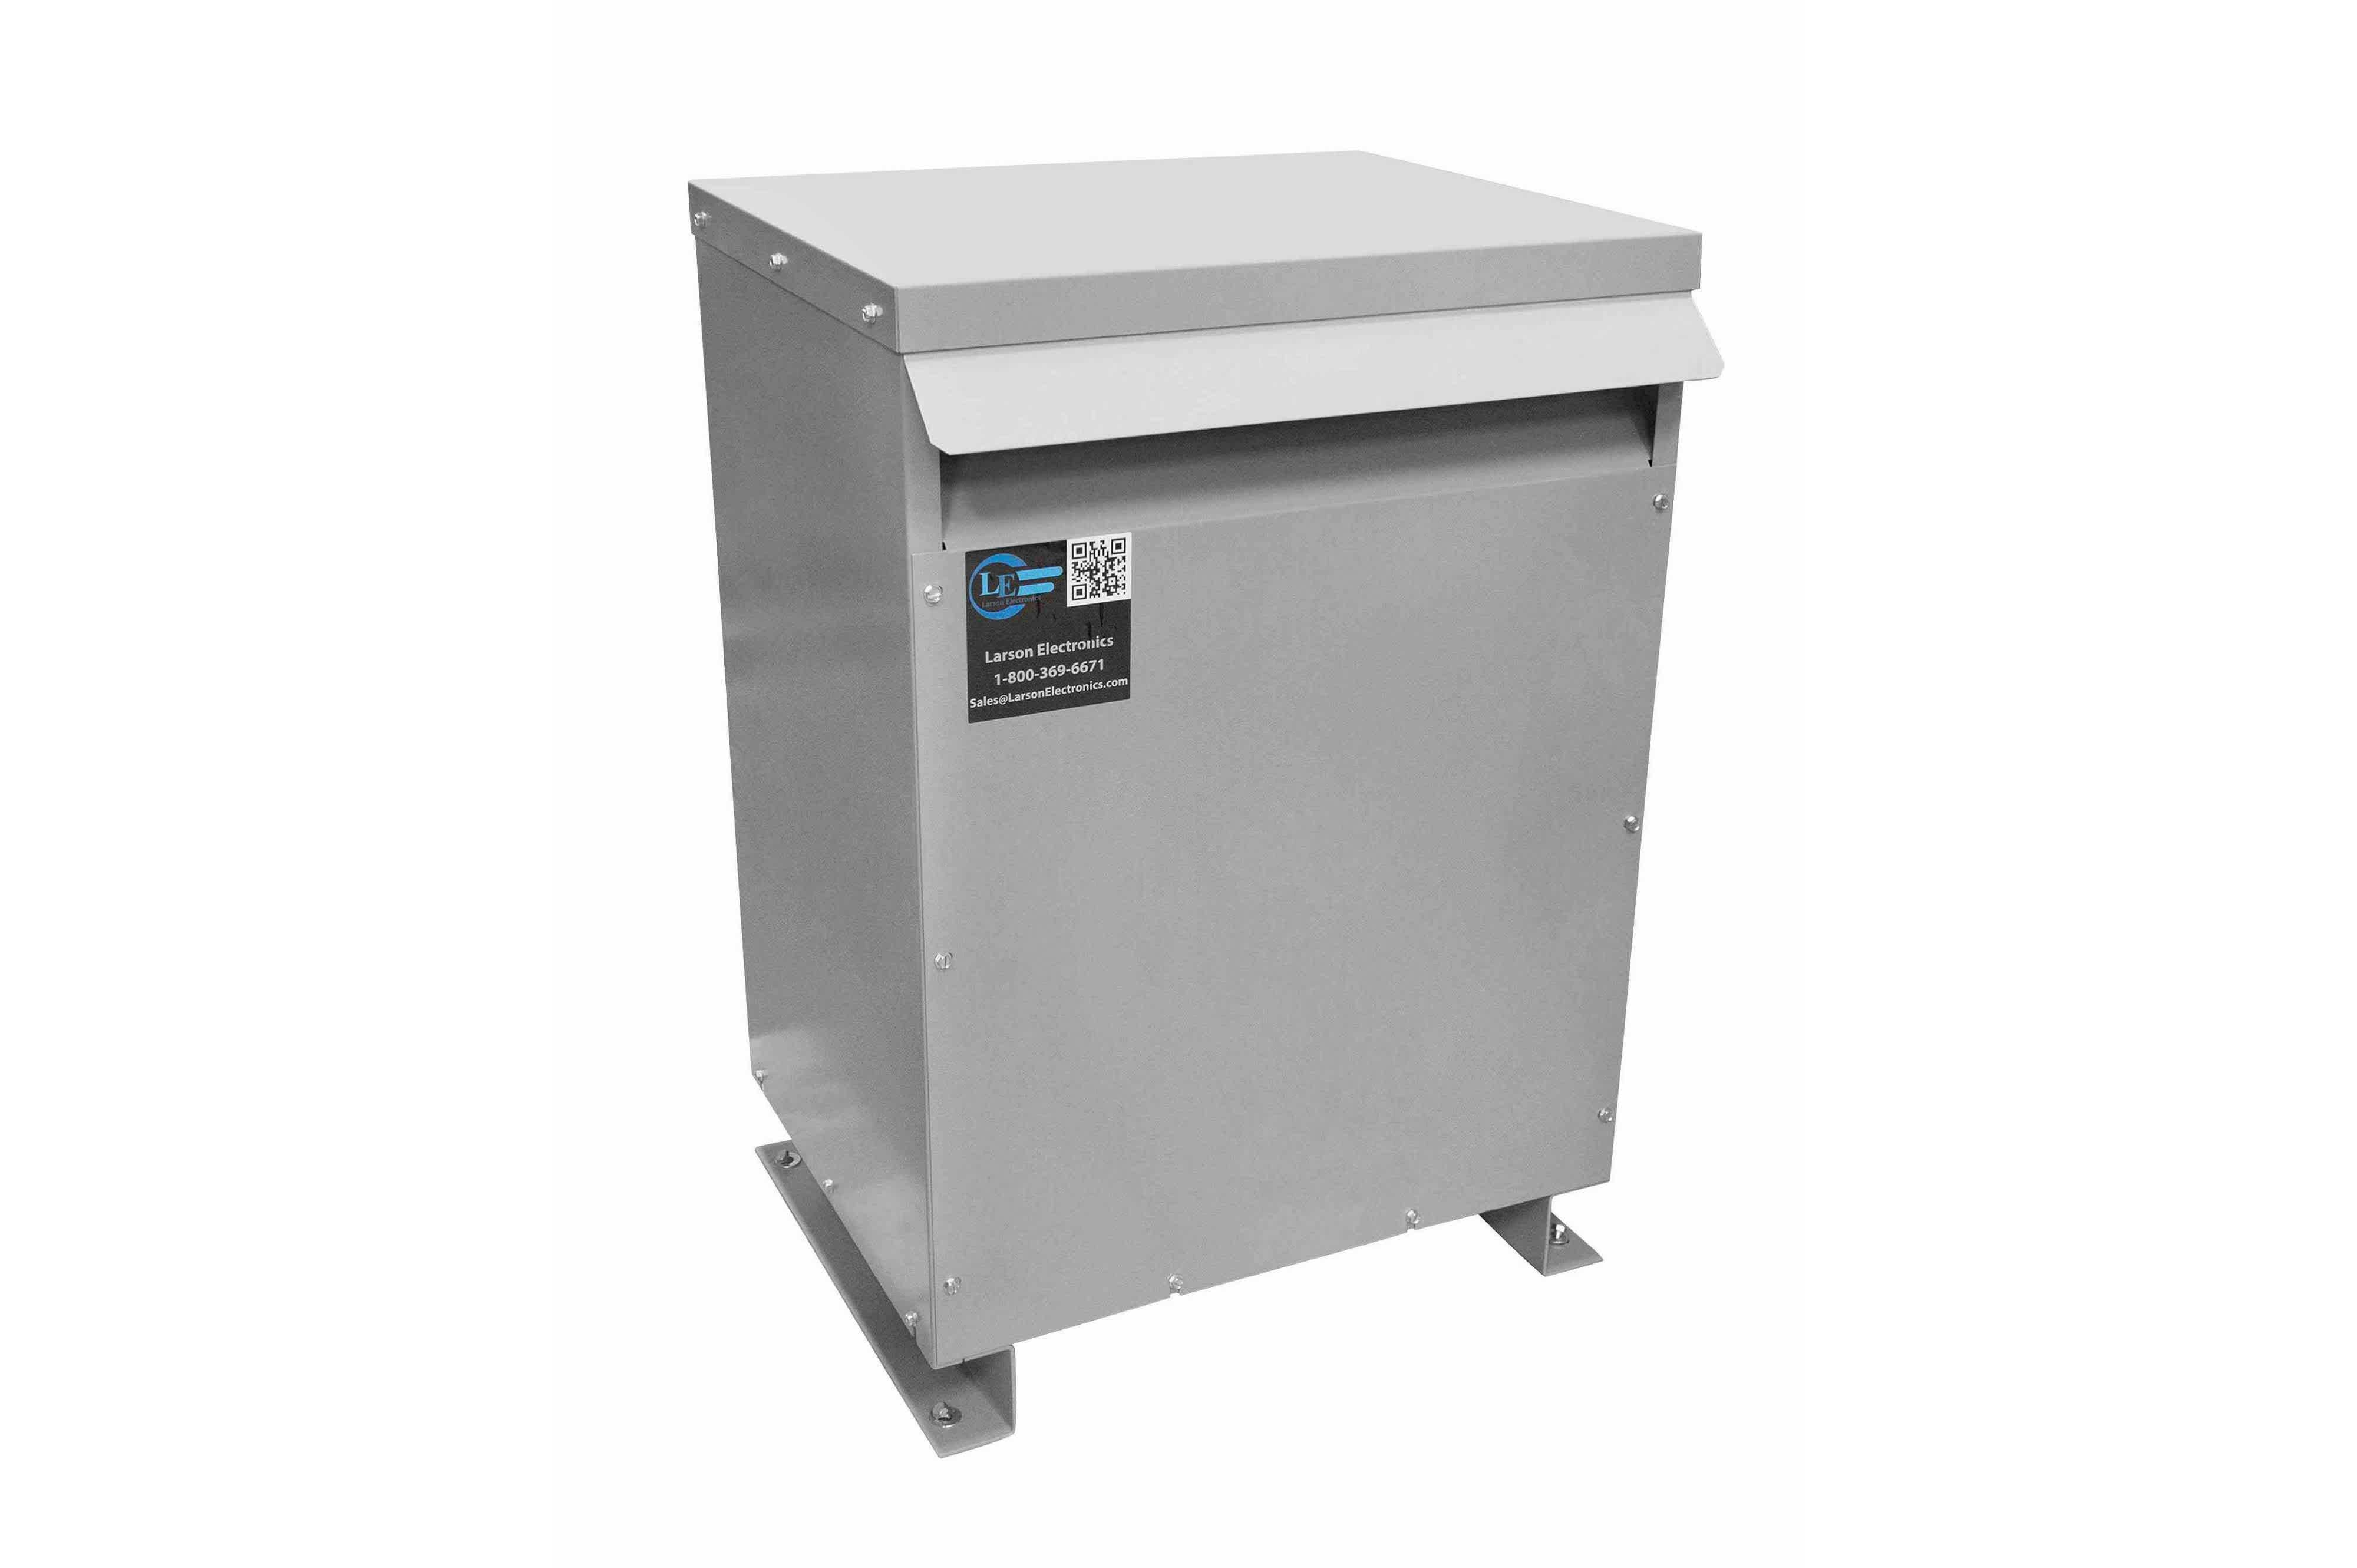 167 kVA 3PH DOE Transformer, 460V Delta Primary, 380Y/220 Wye-N Secondary, N3R, Ventilated, 60 Hz